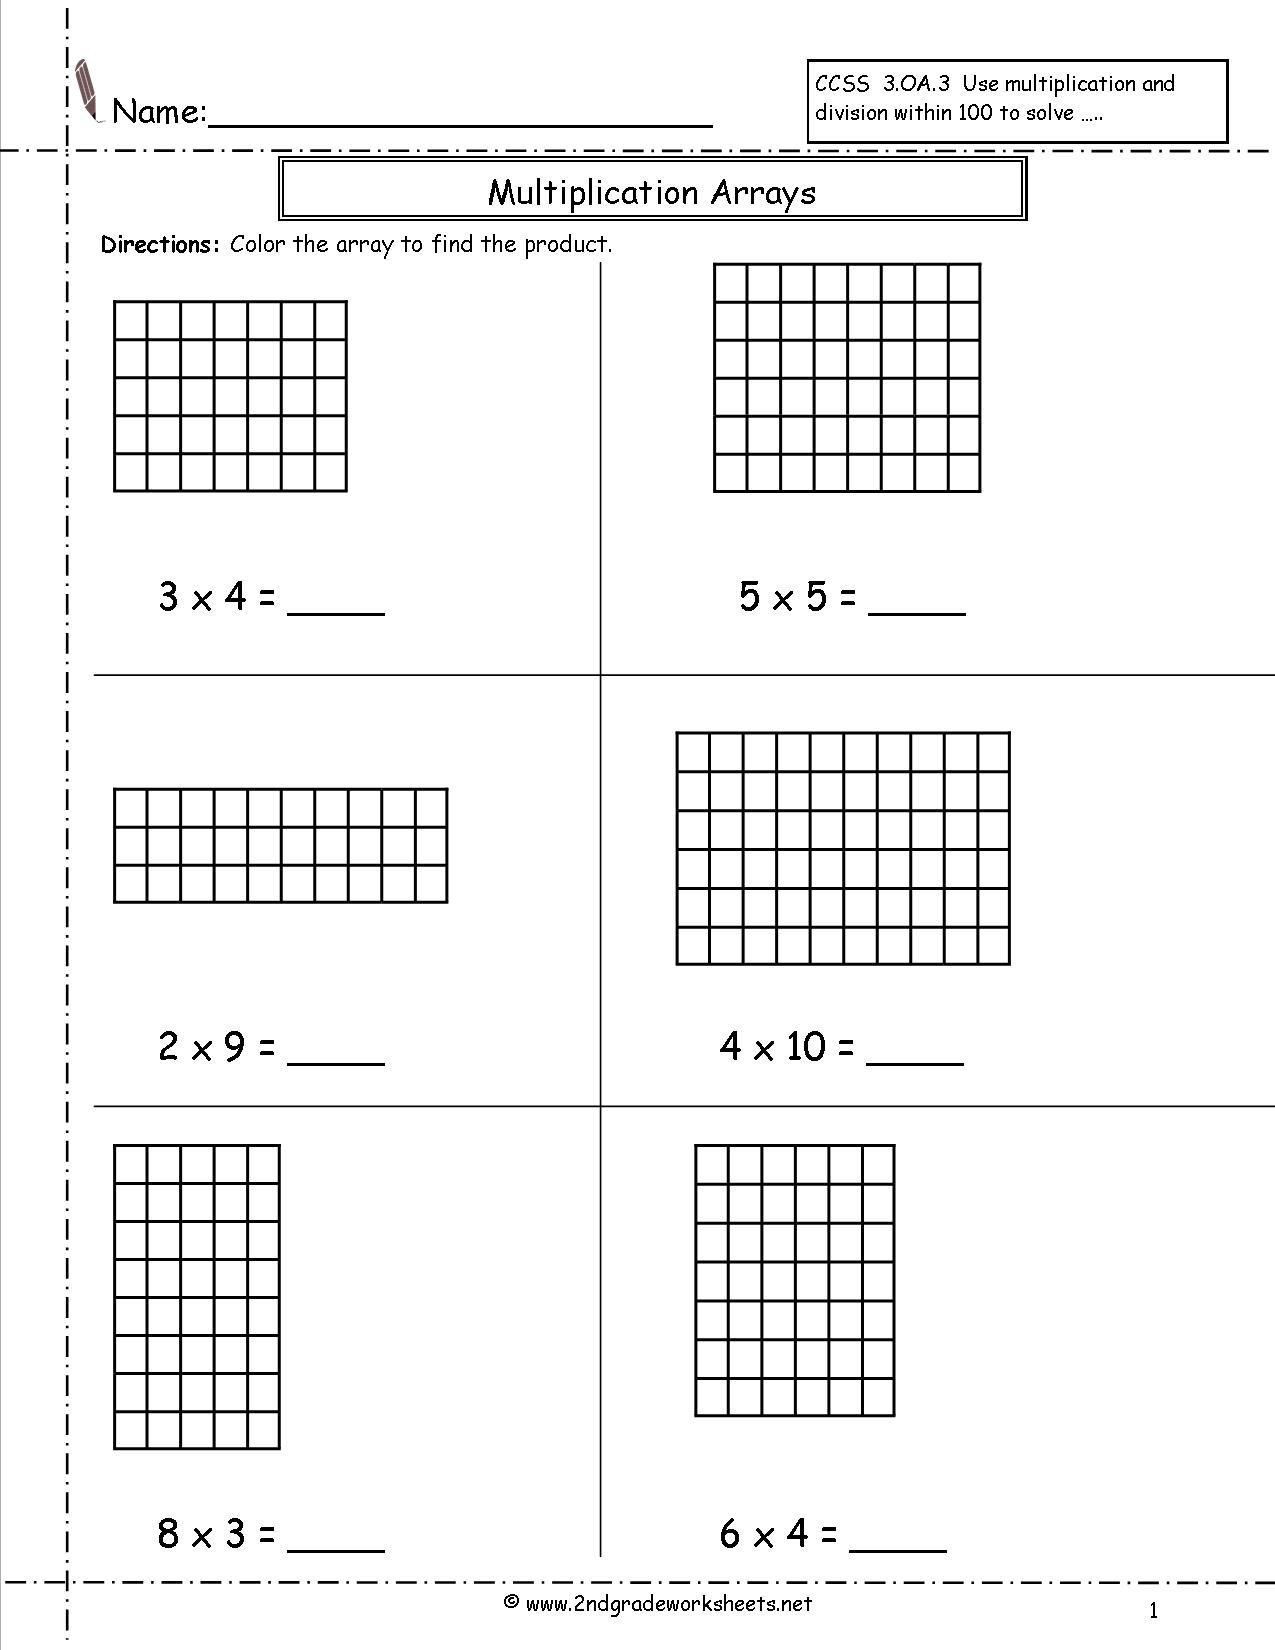 Multiplication Arrays Worksheets 4th Grade 356033